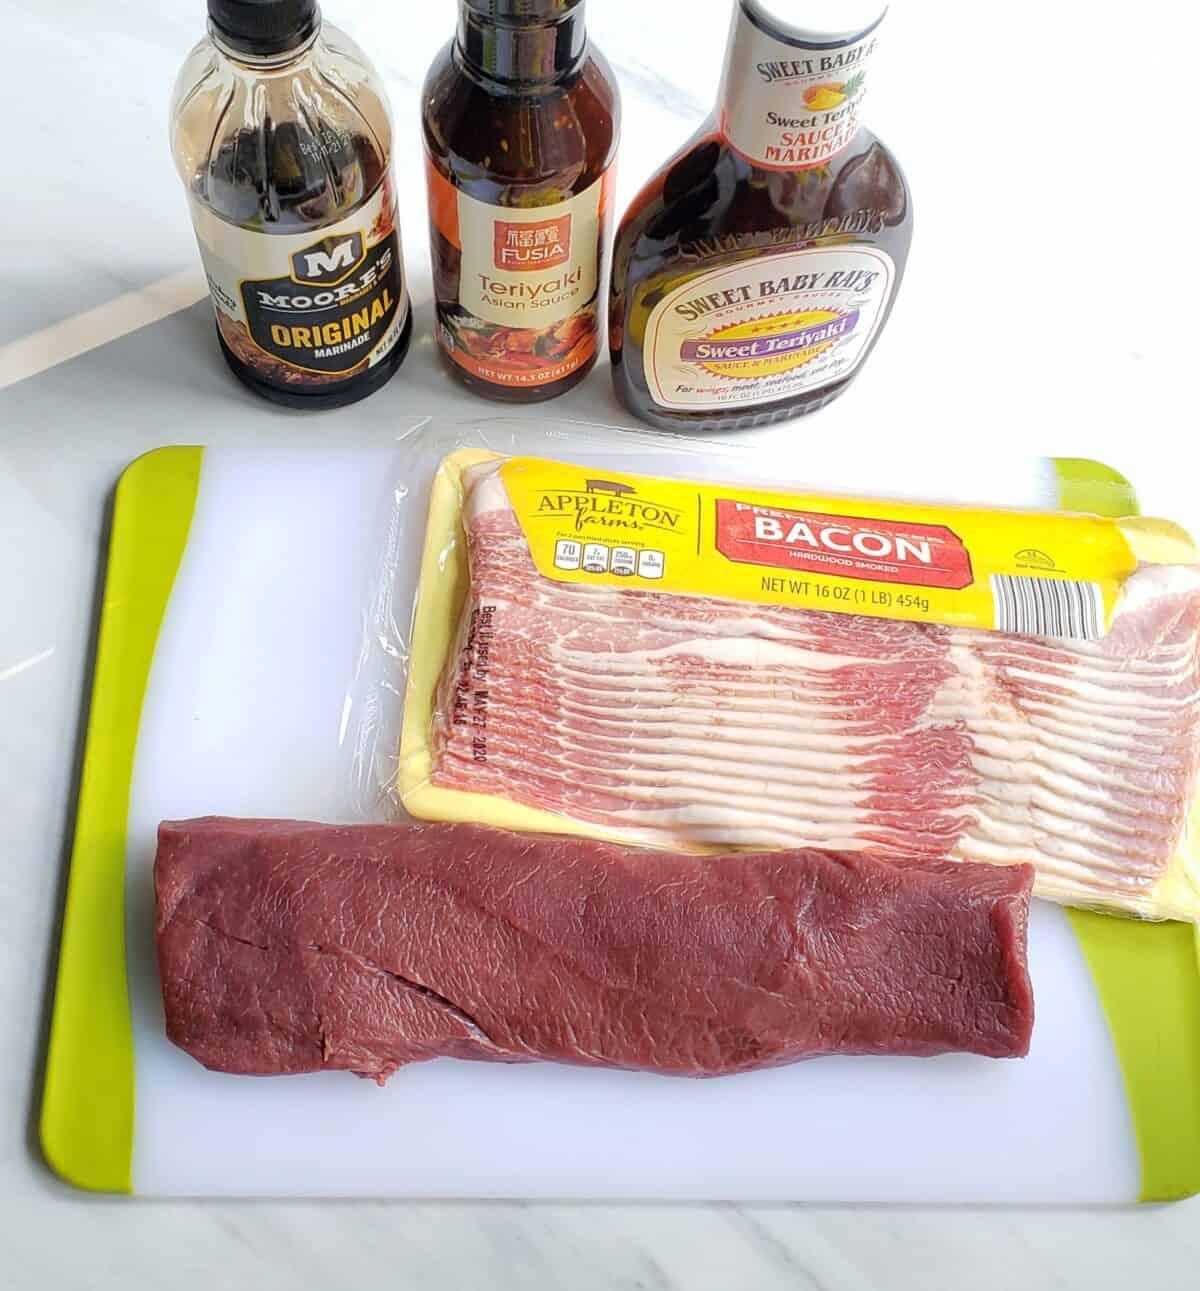 ingredients: bacon, venison roast, teriyaki sauce on a cutting board